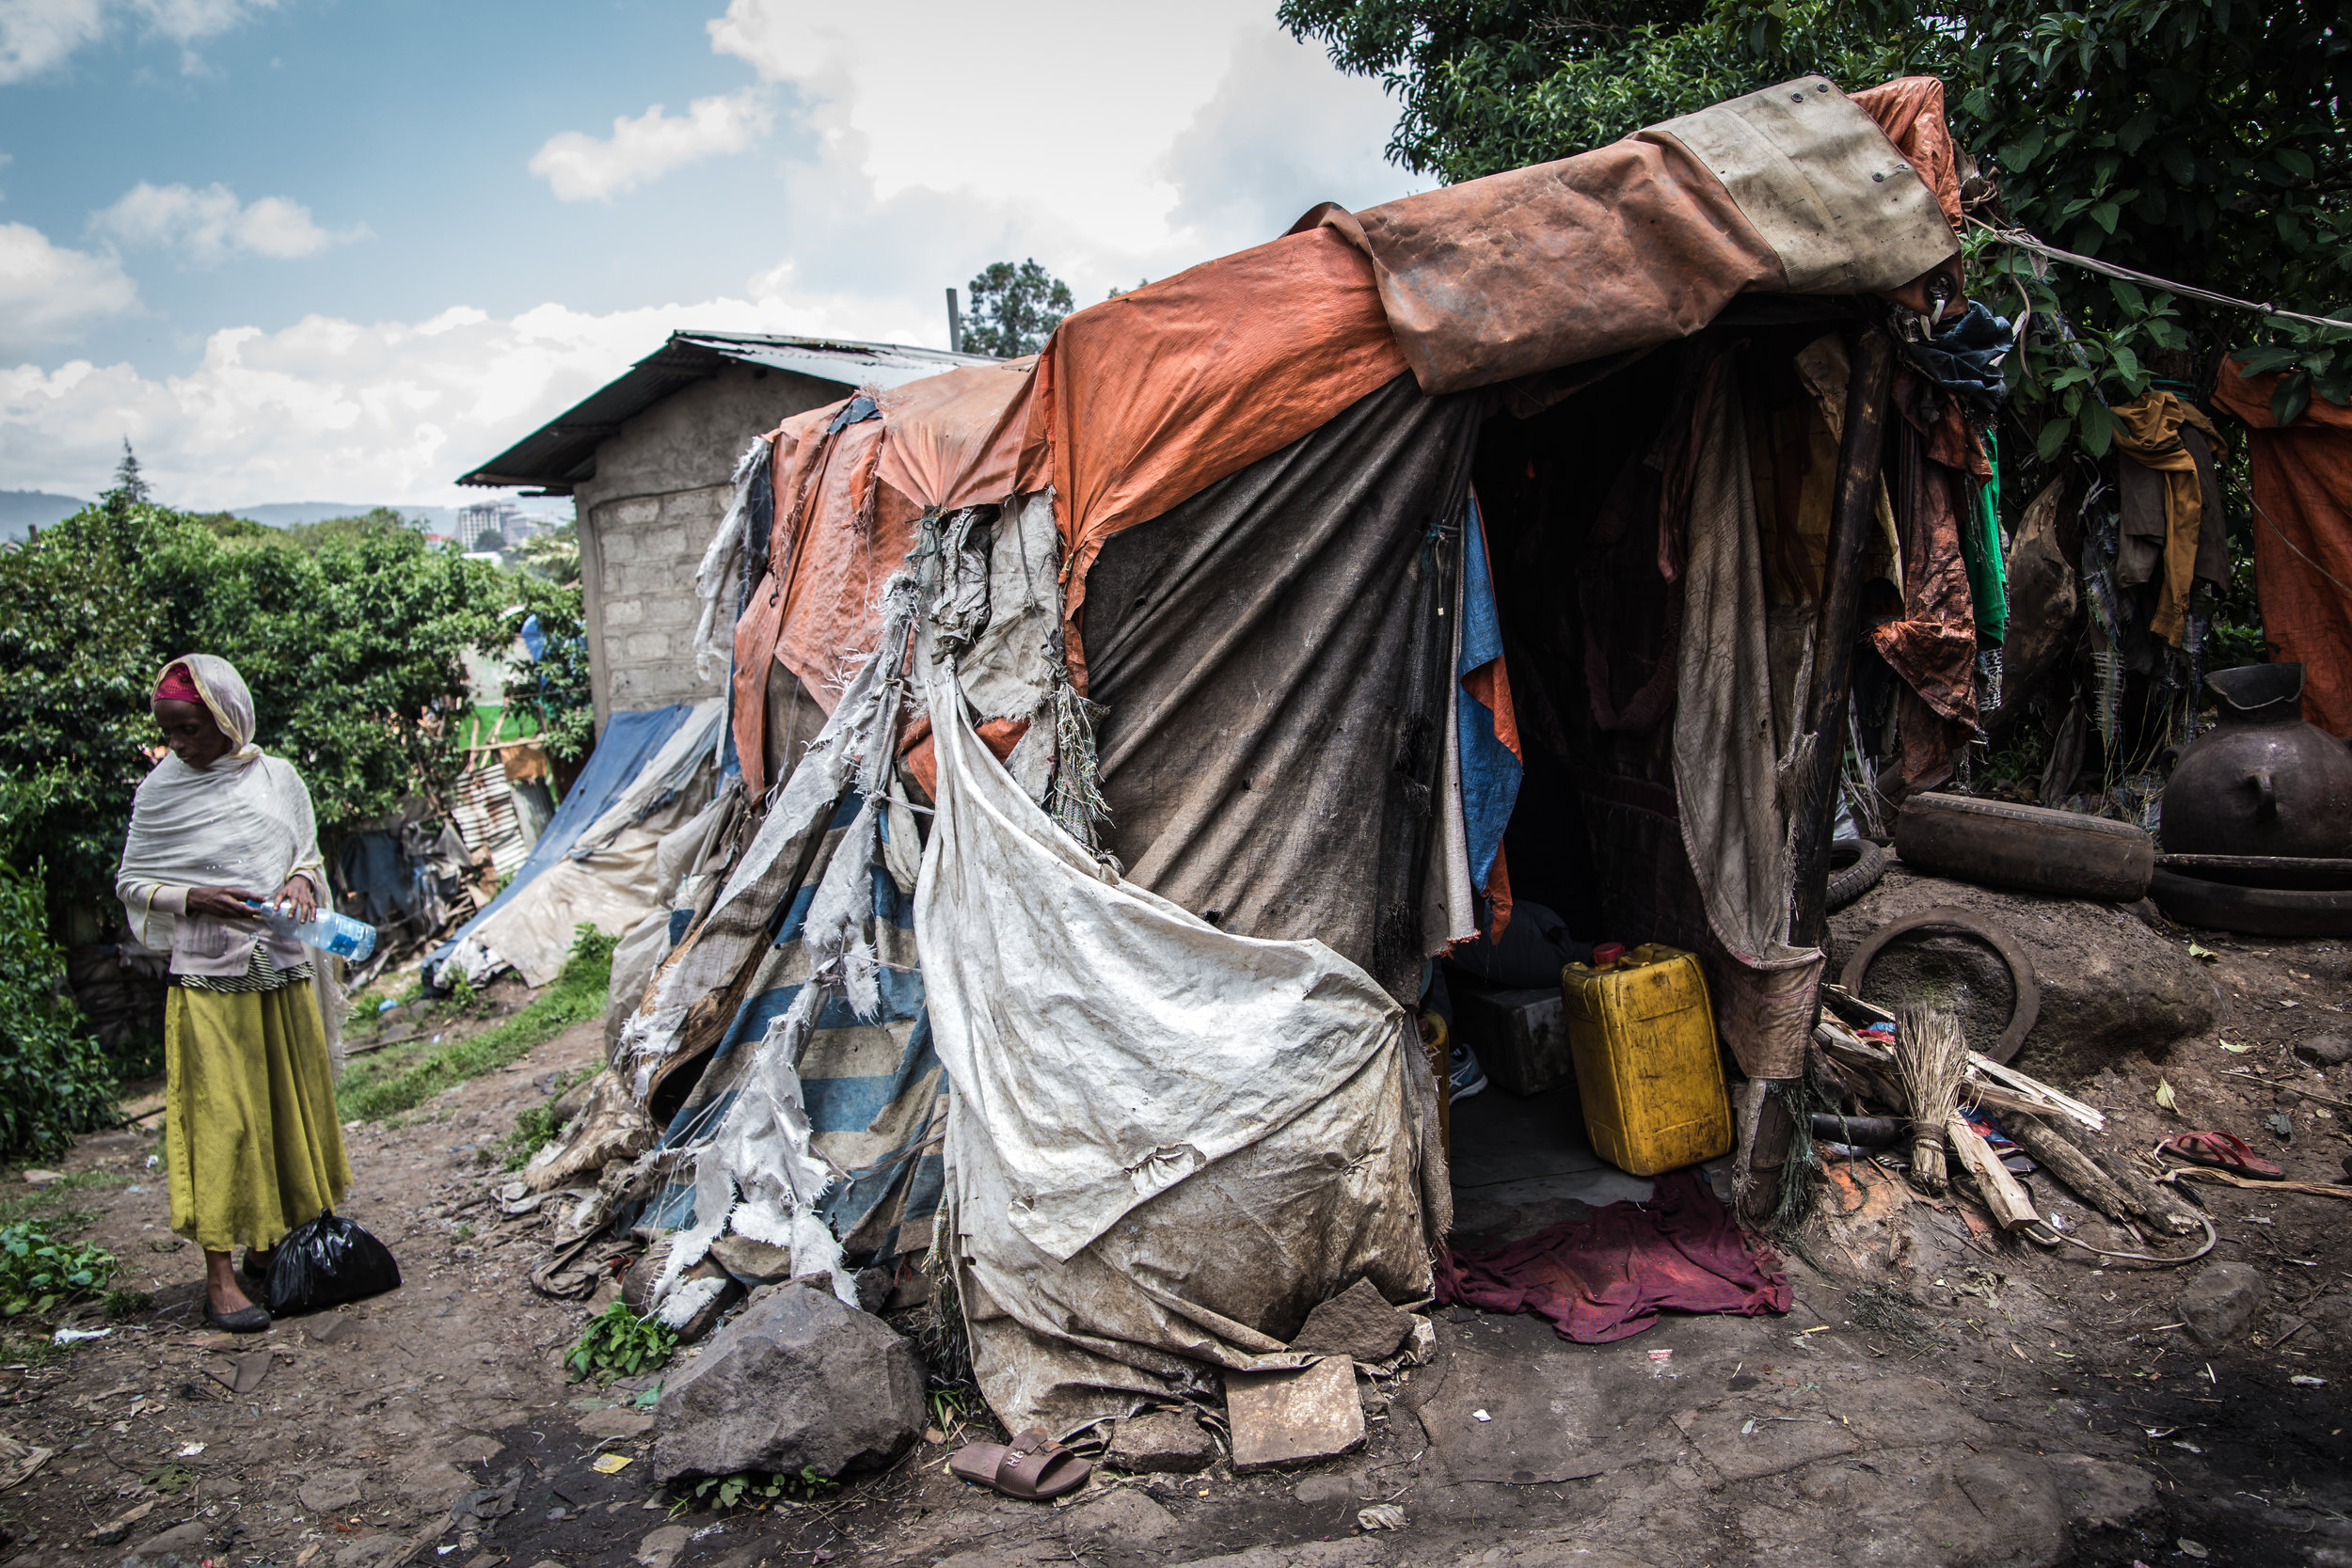 EthiopiaSlums.JPG